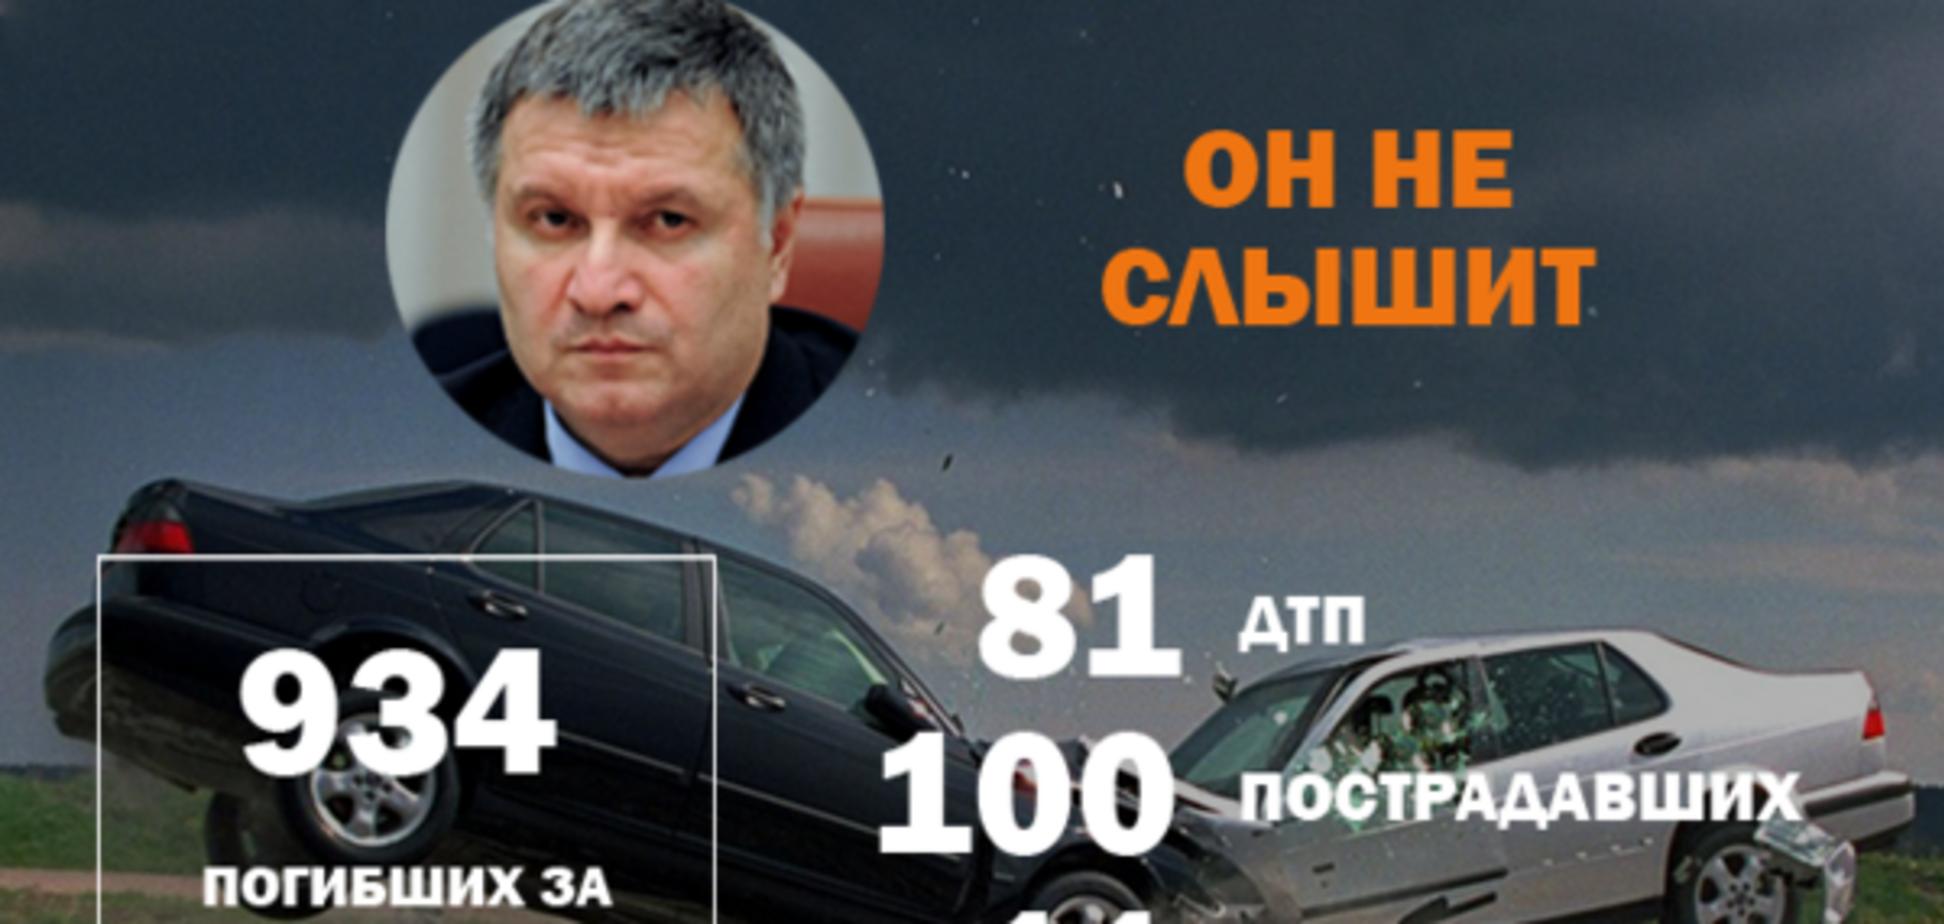 Забрал племянника на тот свет: топ ДТП в Украине за неделю